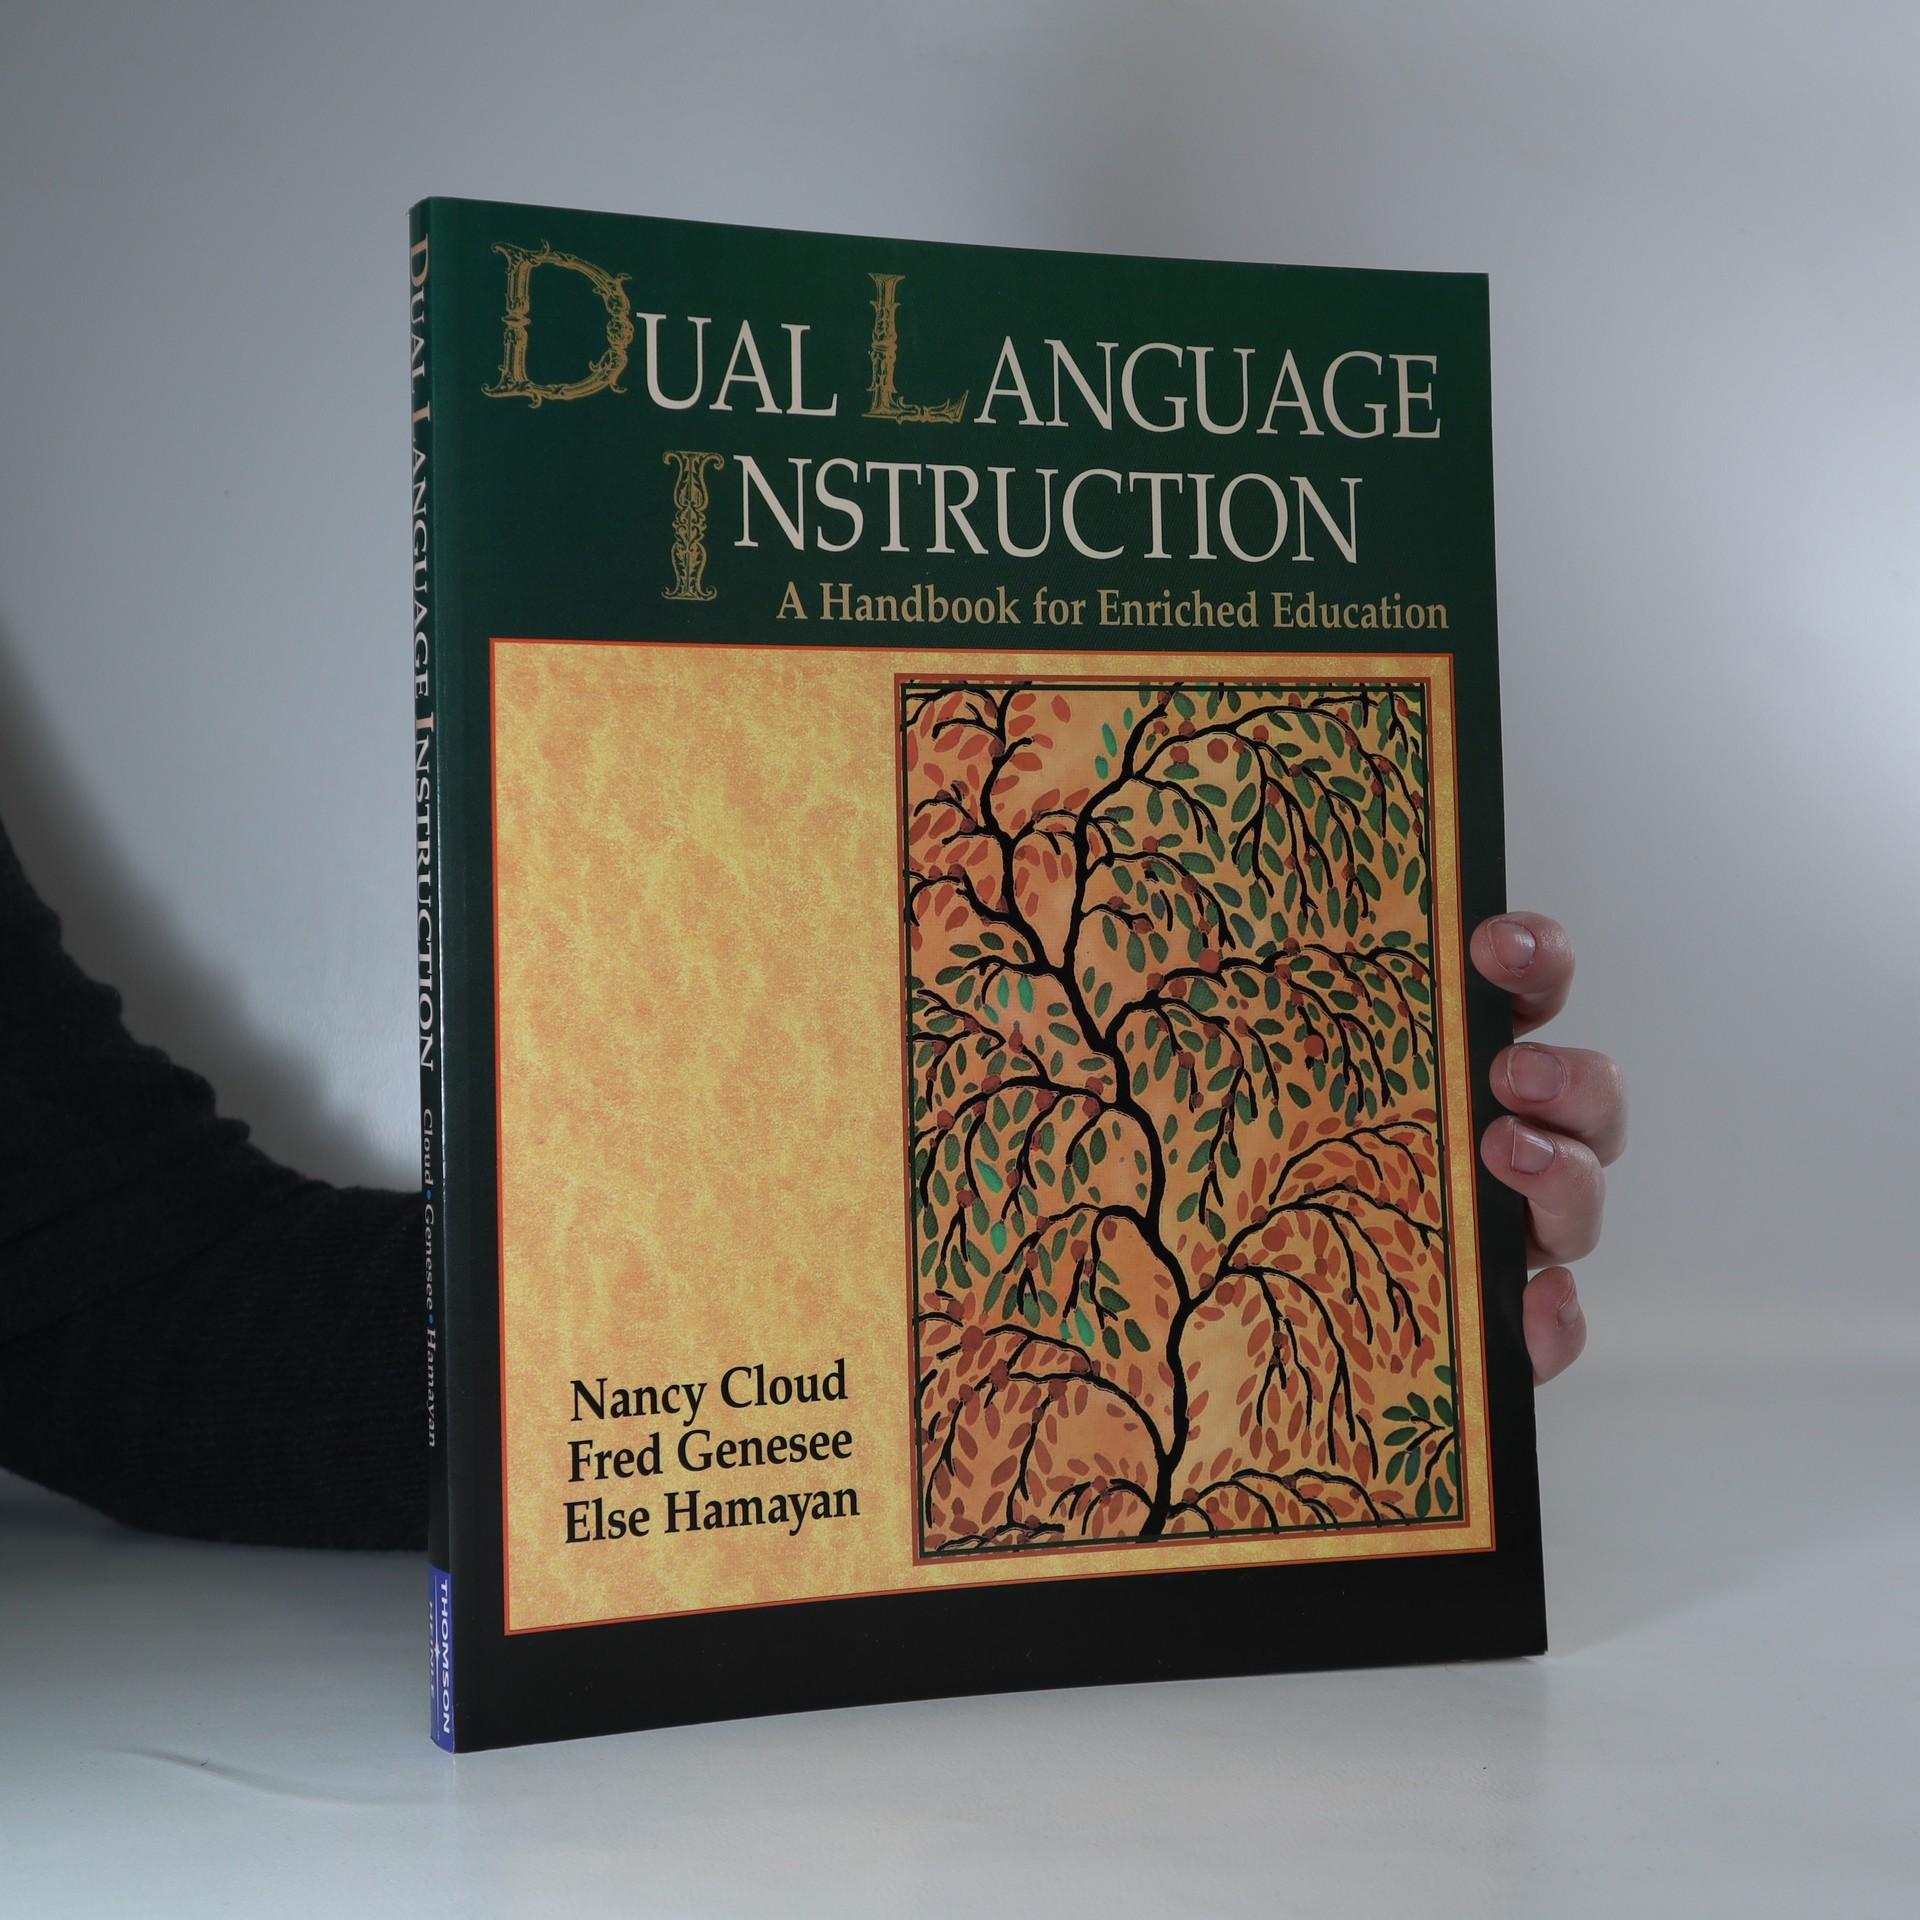 antikvární kniha Dual language instruction : a handbook for enriched education, 2000